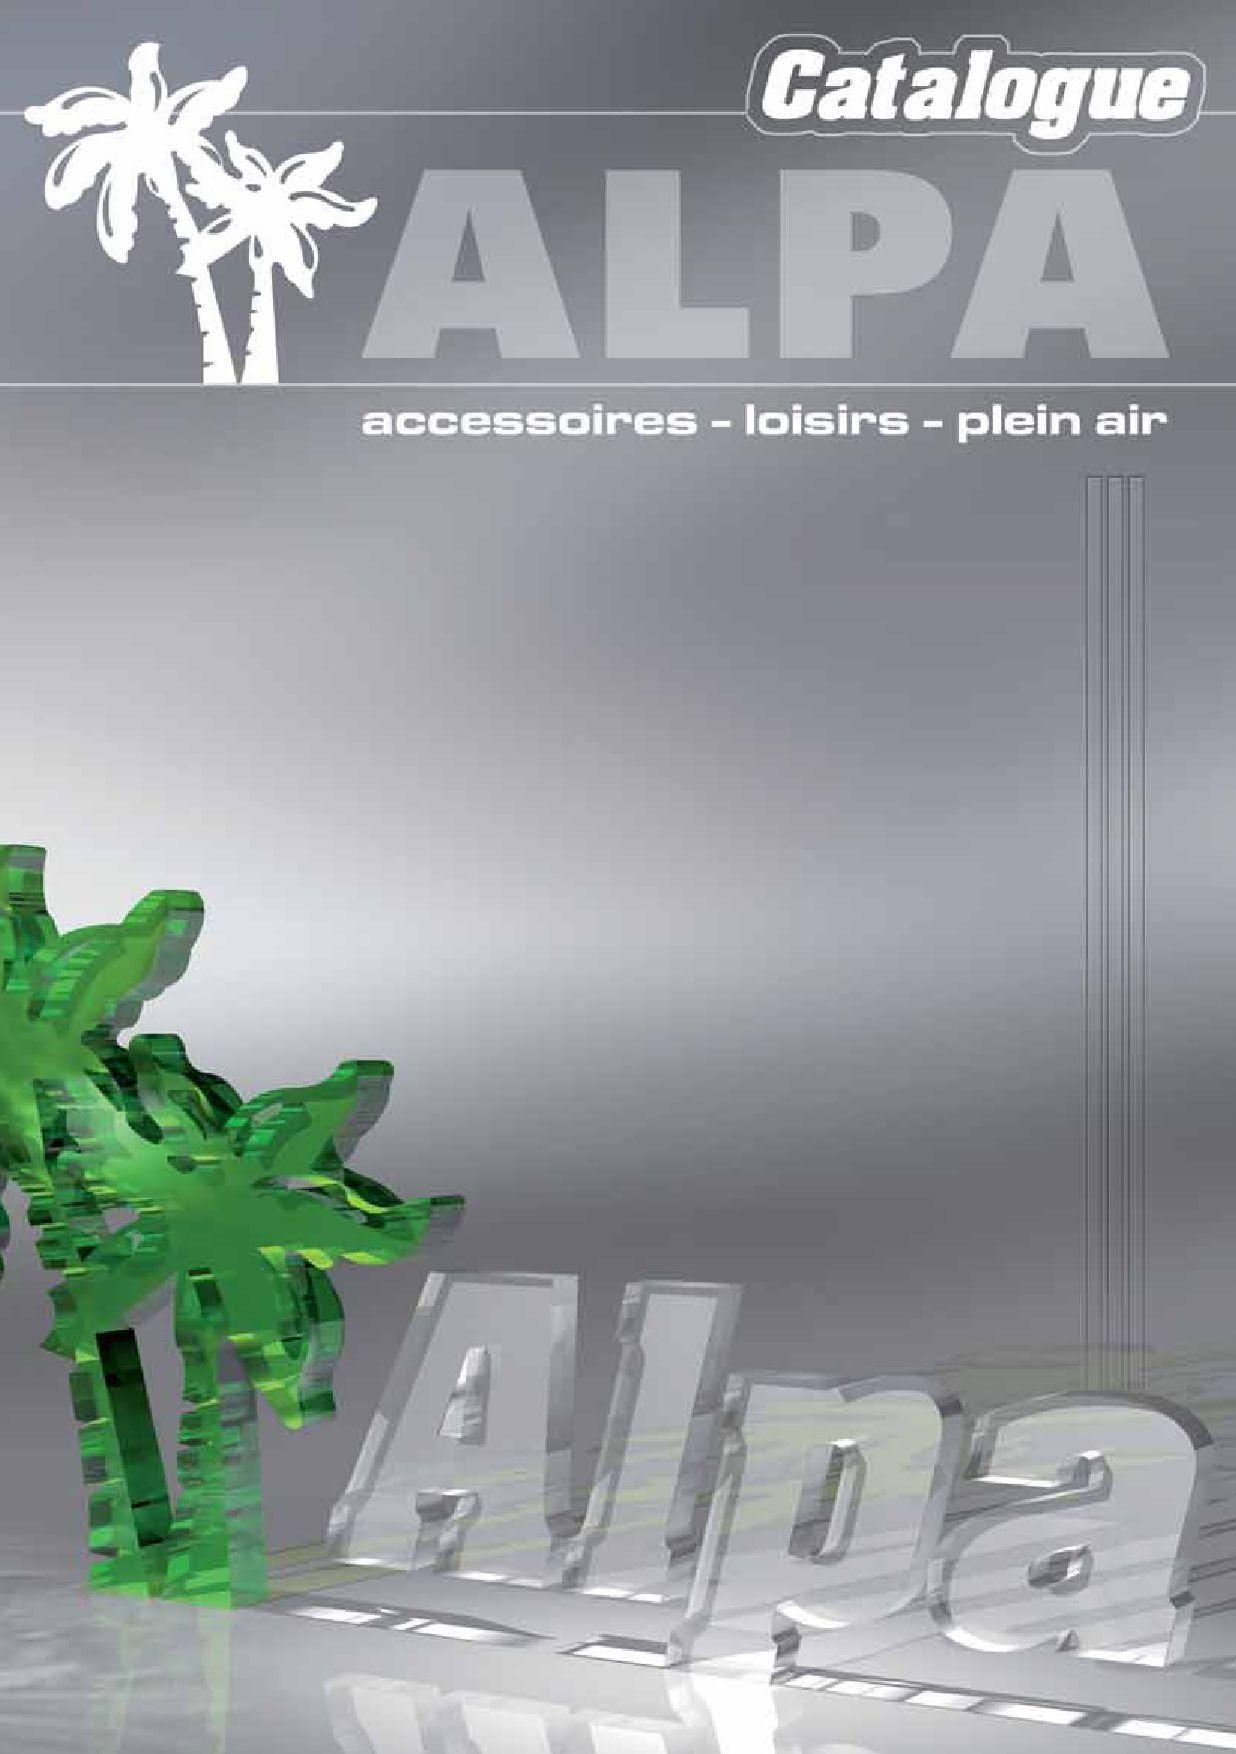 Catalogue ALPA 2009 by LOIC PIOT issuu